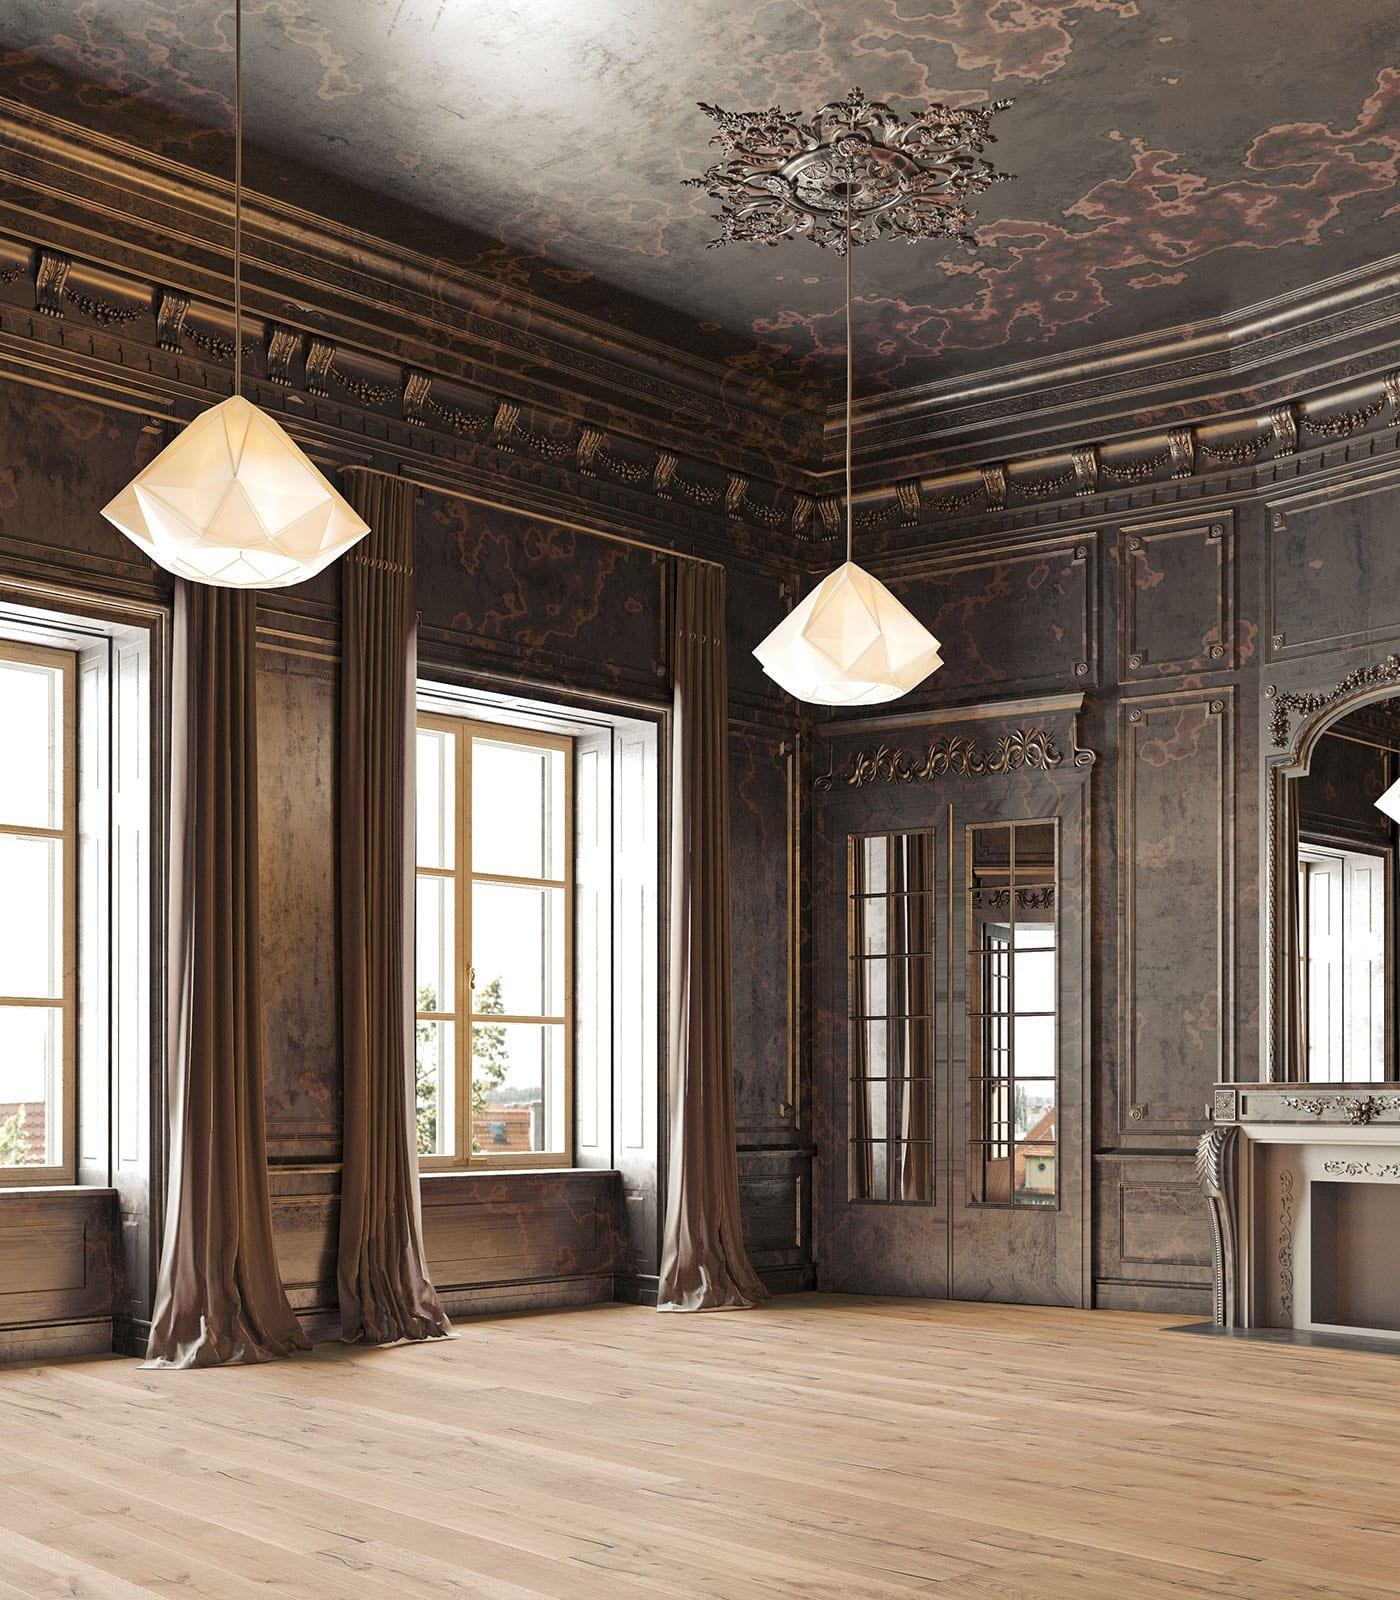 Grampians-european engineered Oak floors